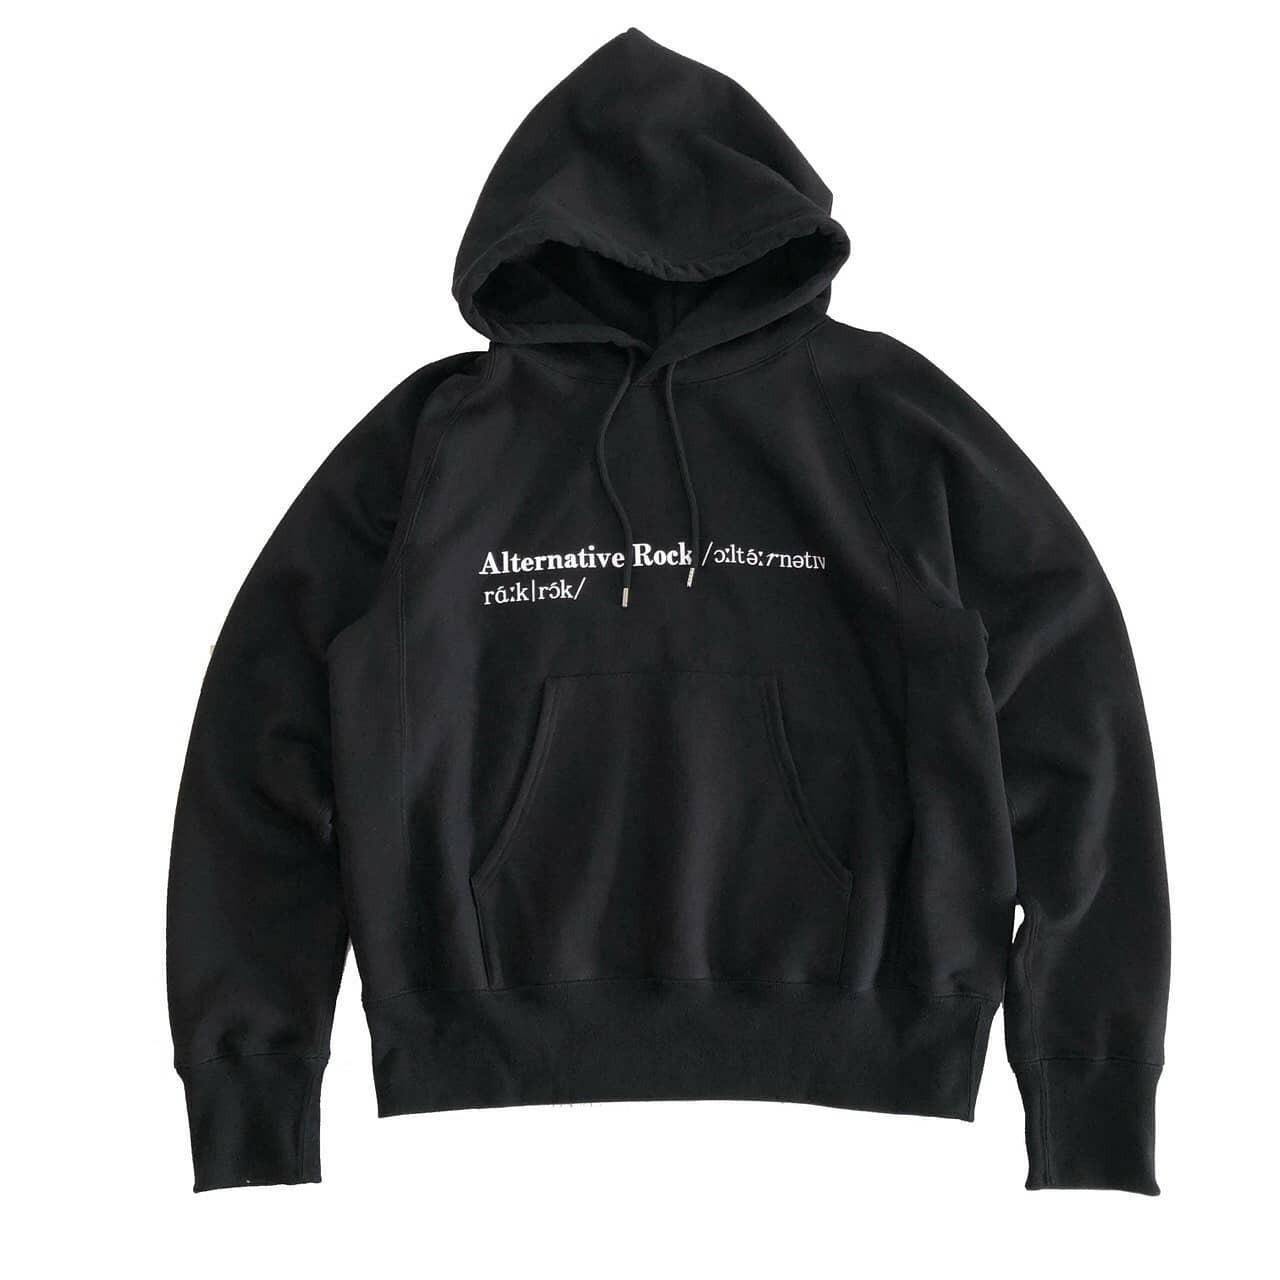 sfc.0001 pullover hoodie Alternative Rock